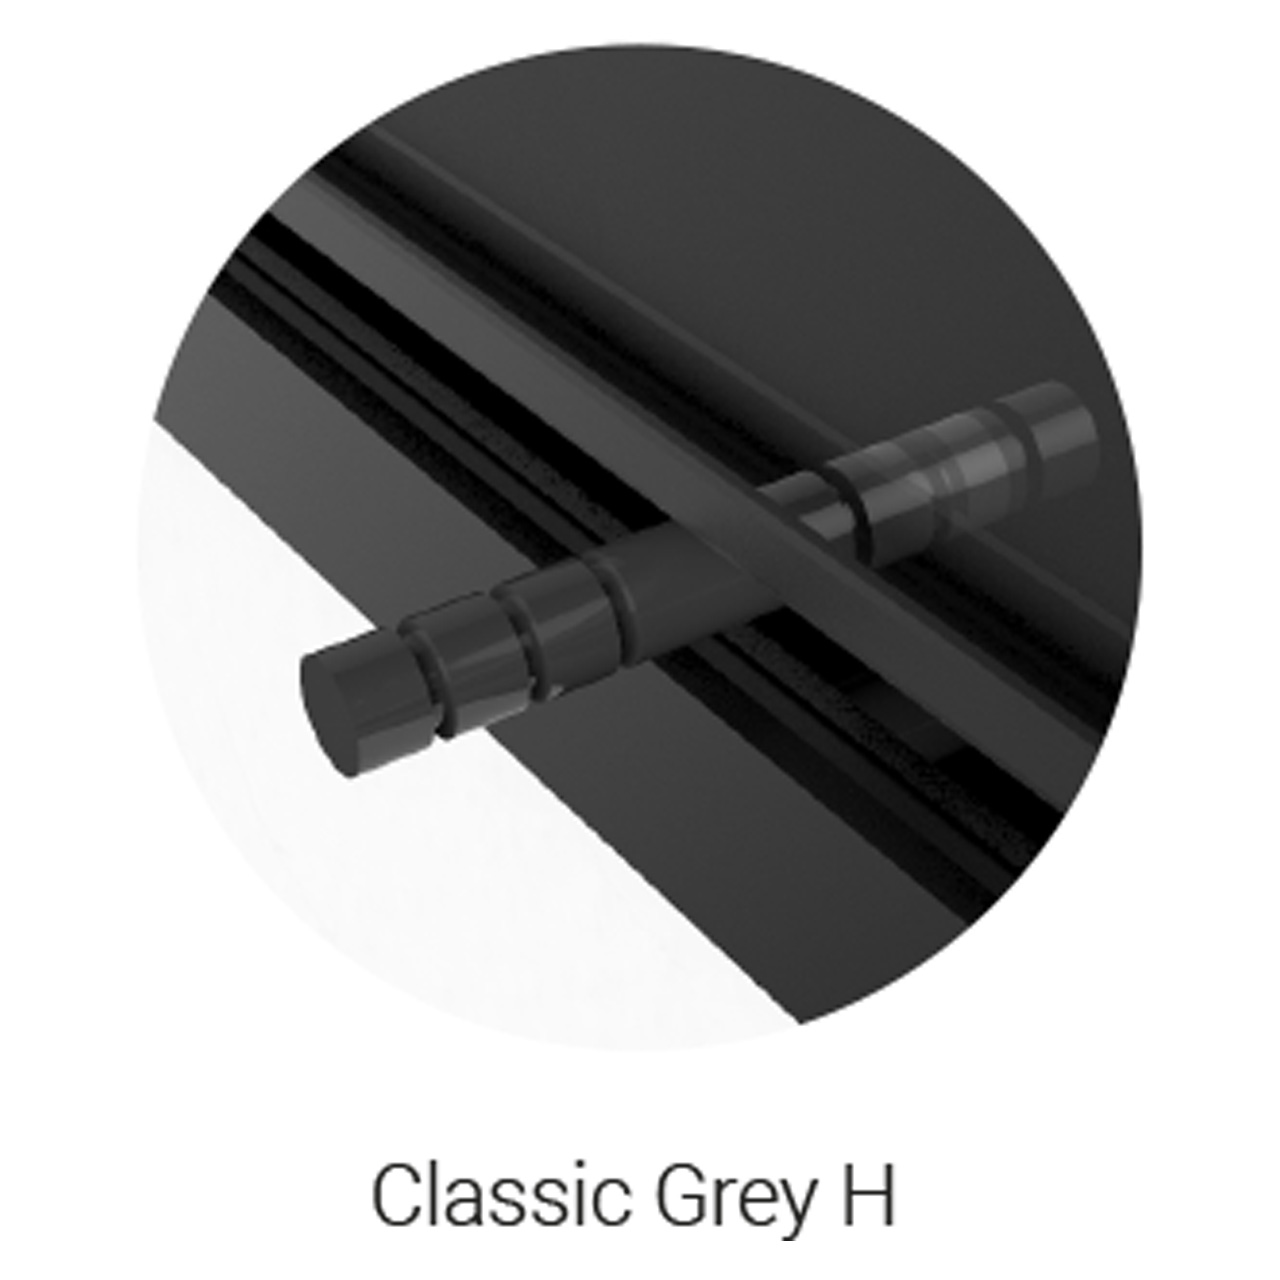 lotus-beto-griff-classic-grey-h